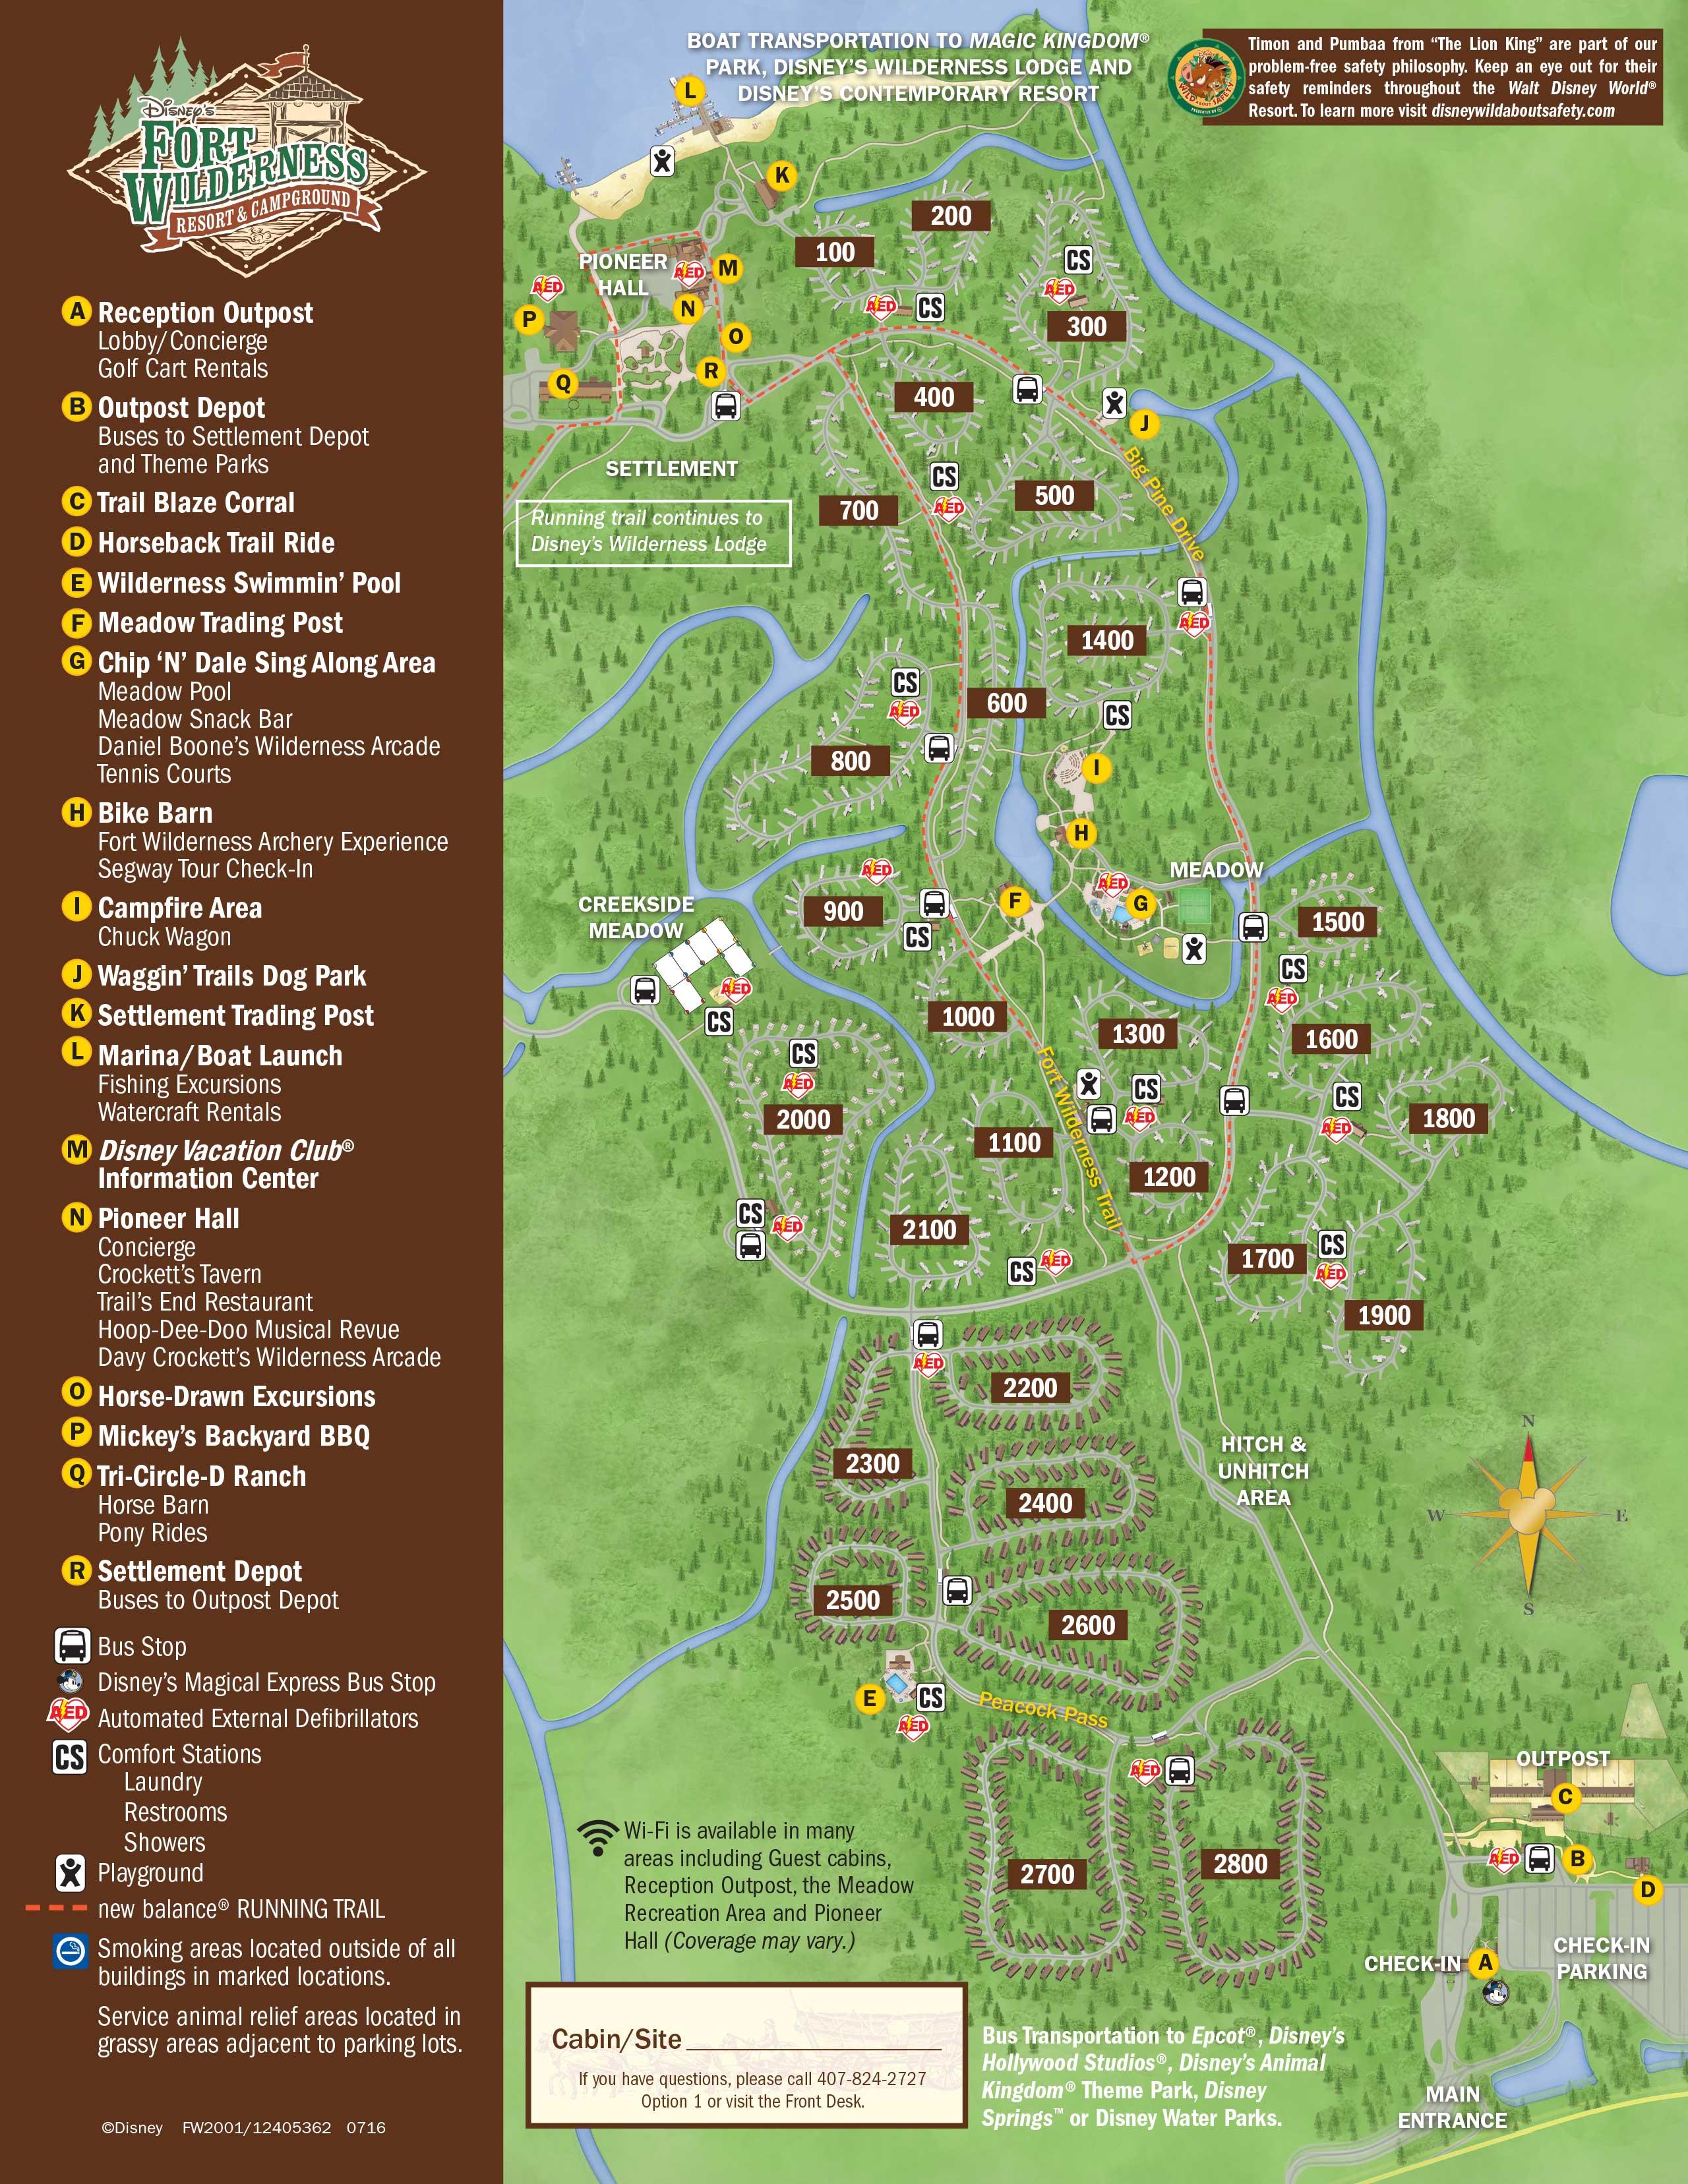 April 2017 Walt Disney World Resort Hotel Maps Photo 23 Of 33